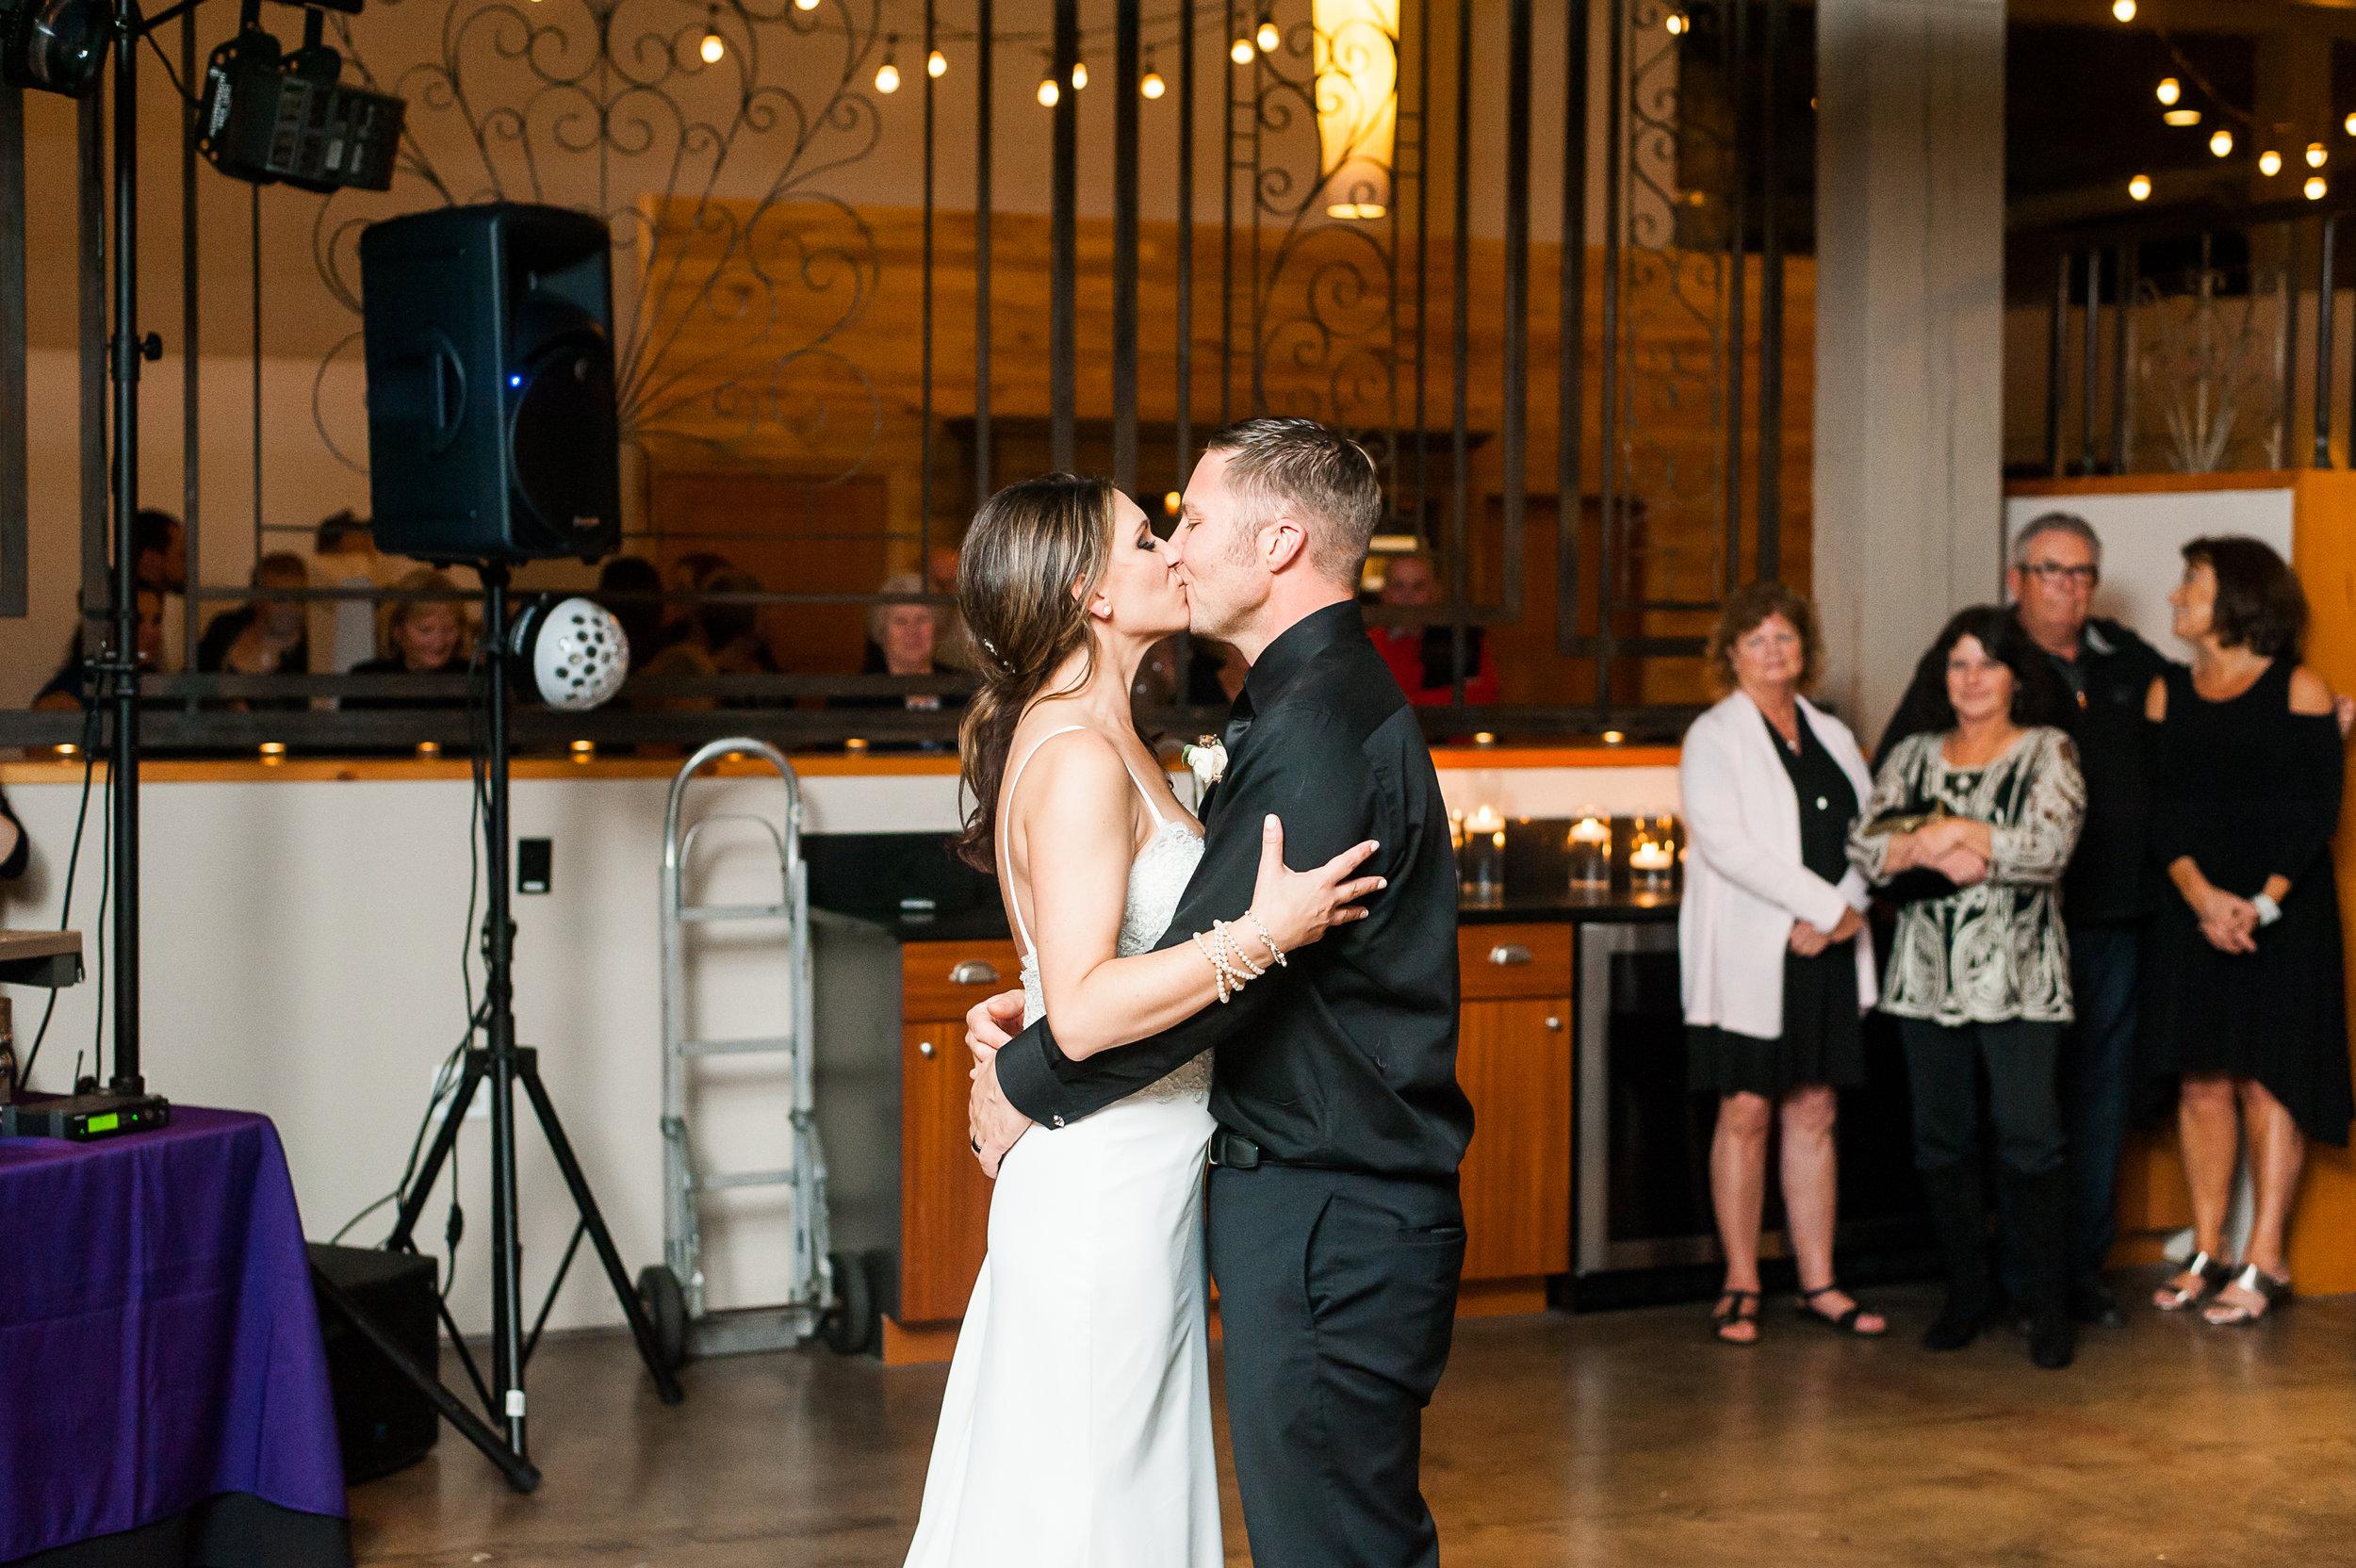 JJ-wedding-Van-Wyhe-Photography-581.jpg